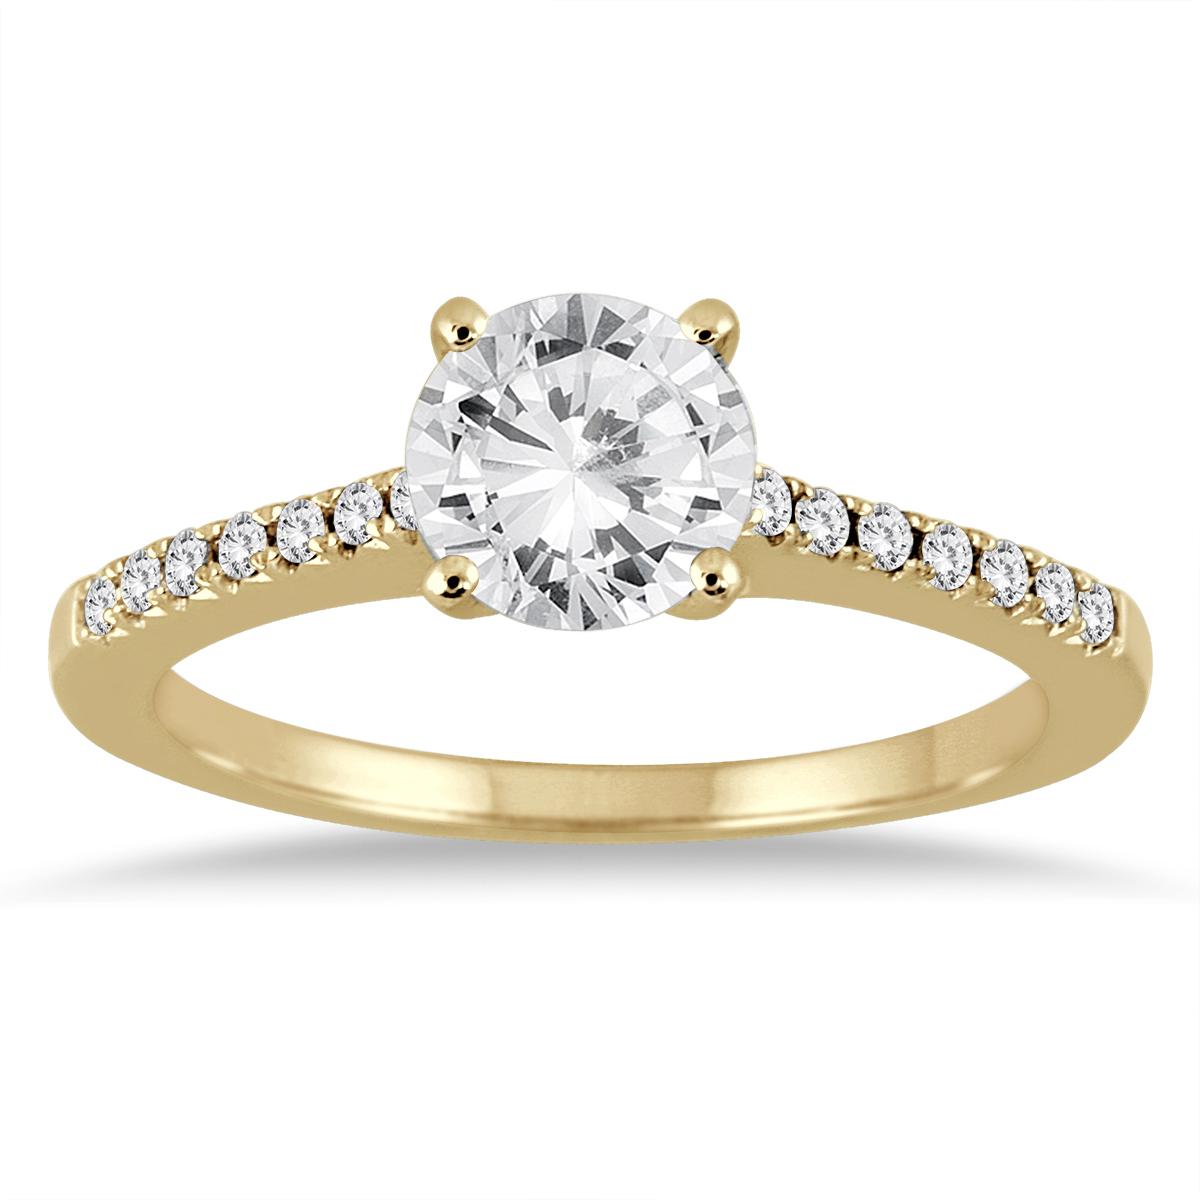 1 1/8 Carat TW Diamond Ring in 14K Yellow Gold